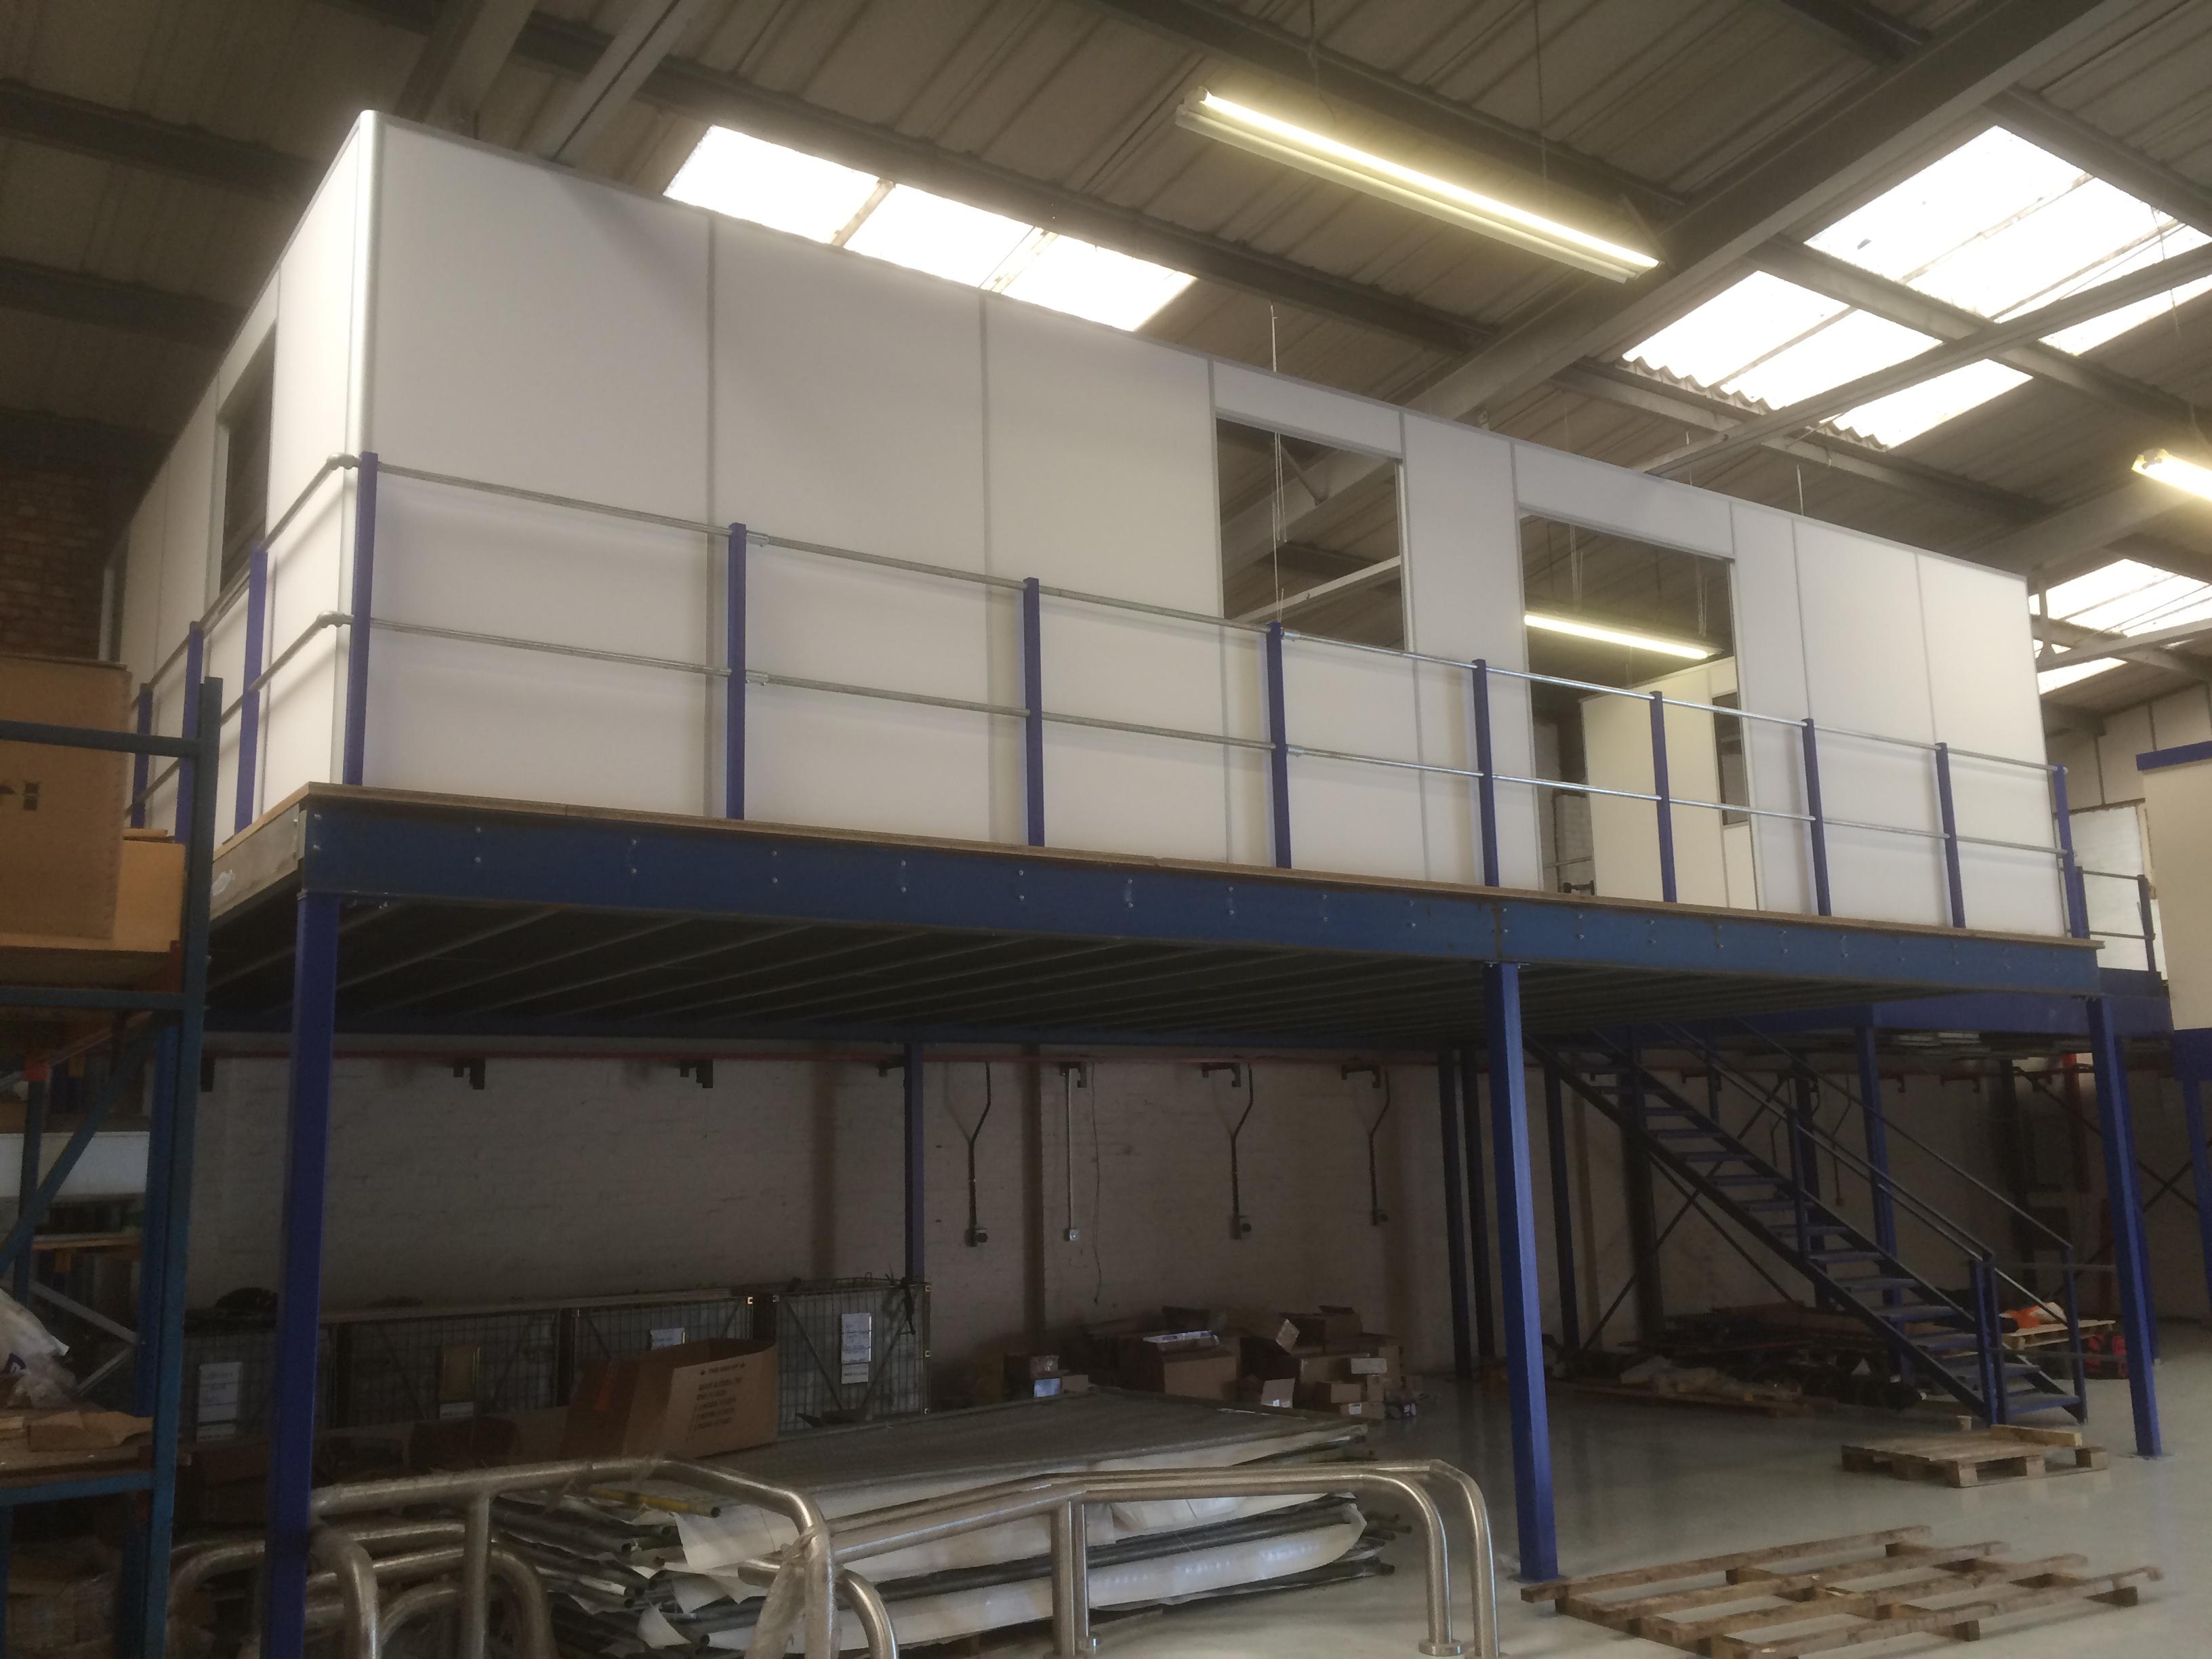 OFFICE BUILD ON MEZZANINE FLOOR  Commercial Refurbishment  Office Partitioning  Masons Interiors